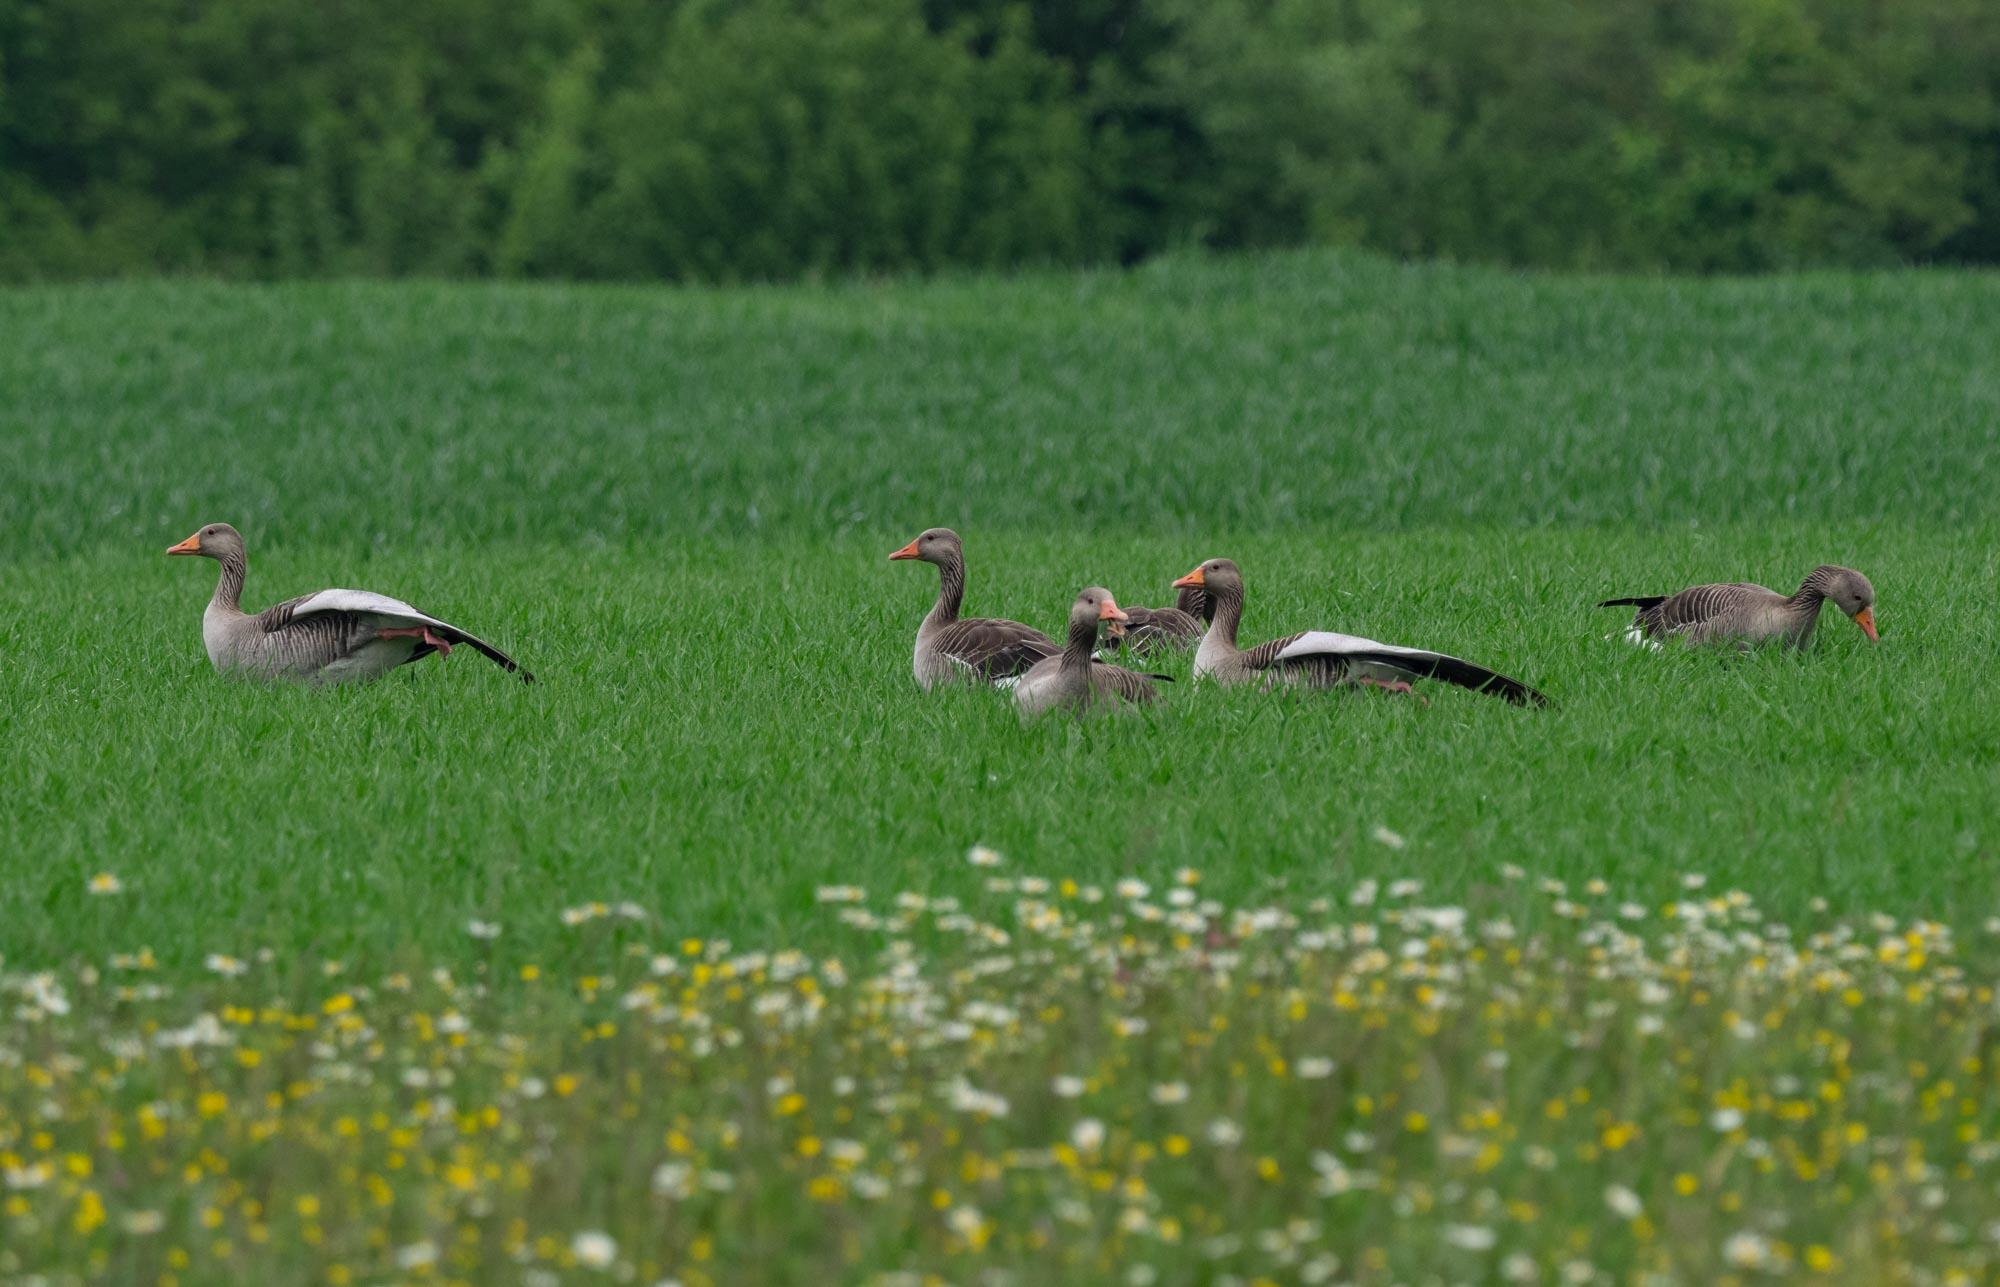 Greylag Geese feeding in nearby wheat fields